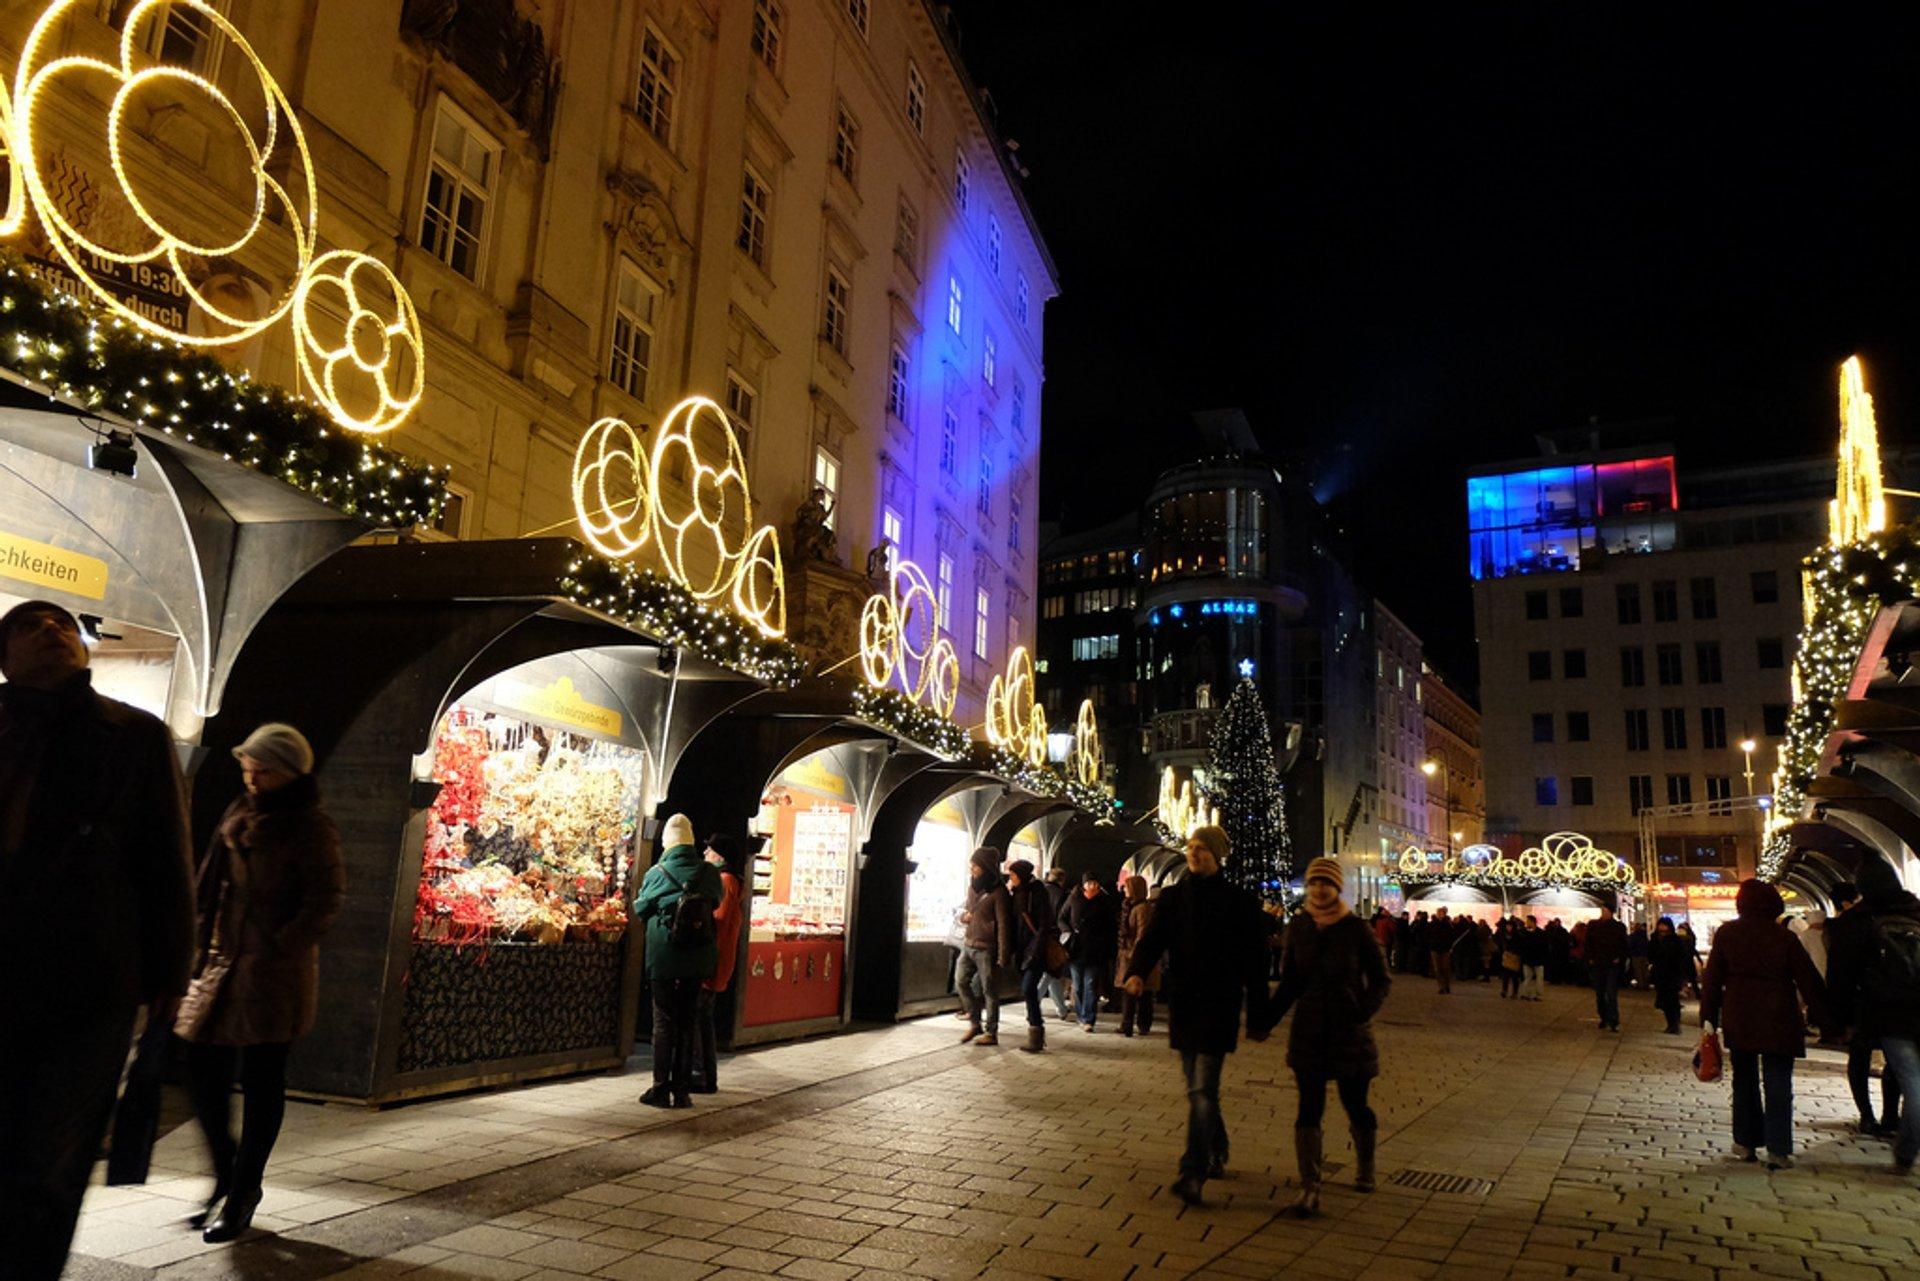 Christmas Markets (Weihnachtsmärkte) in Vienna - Best Season 2019